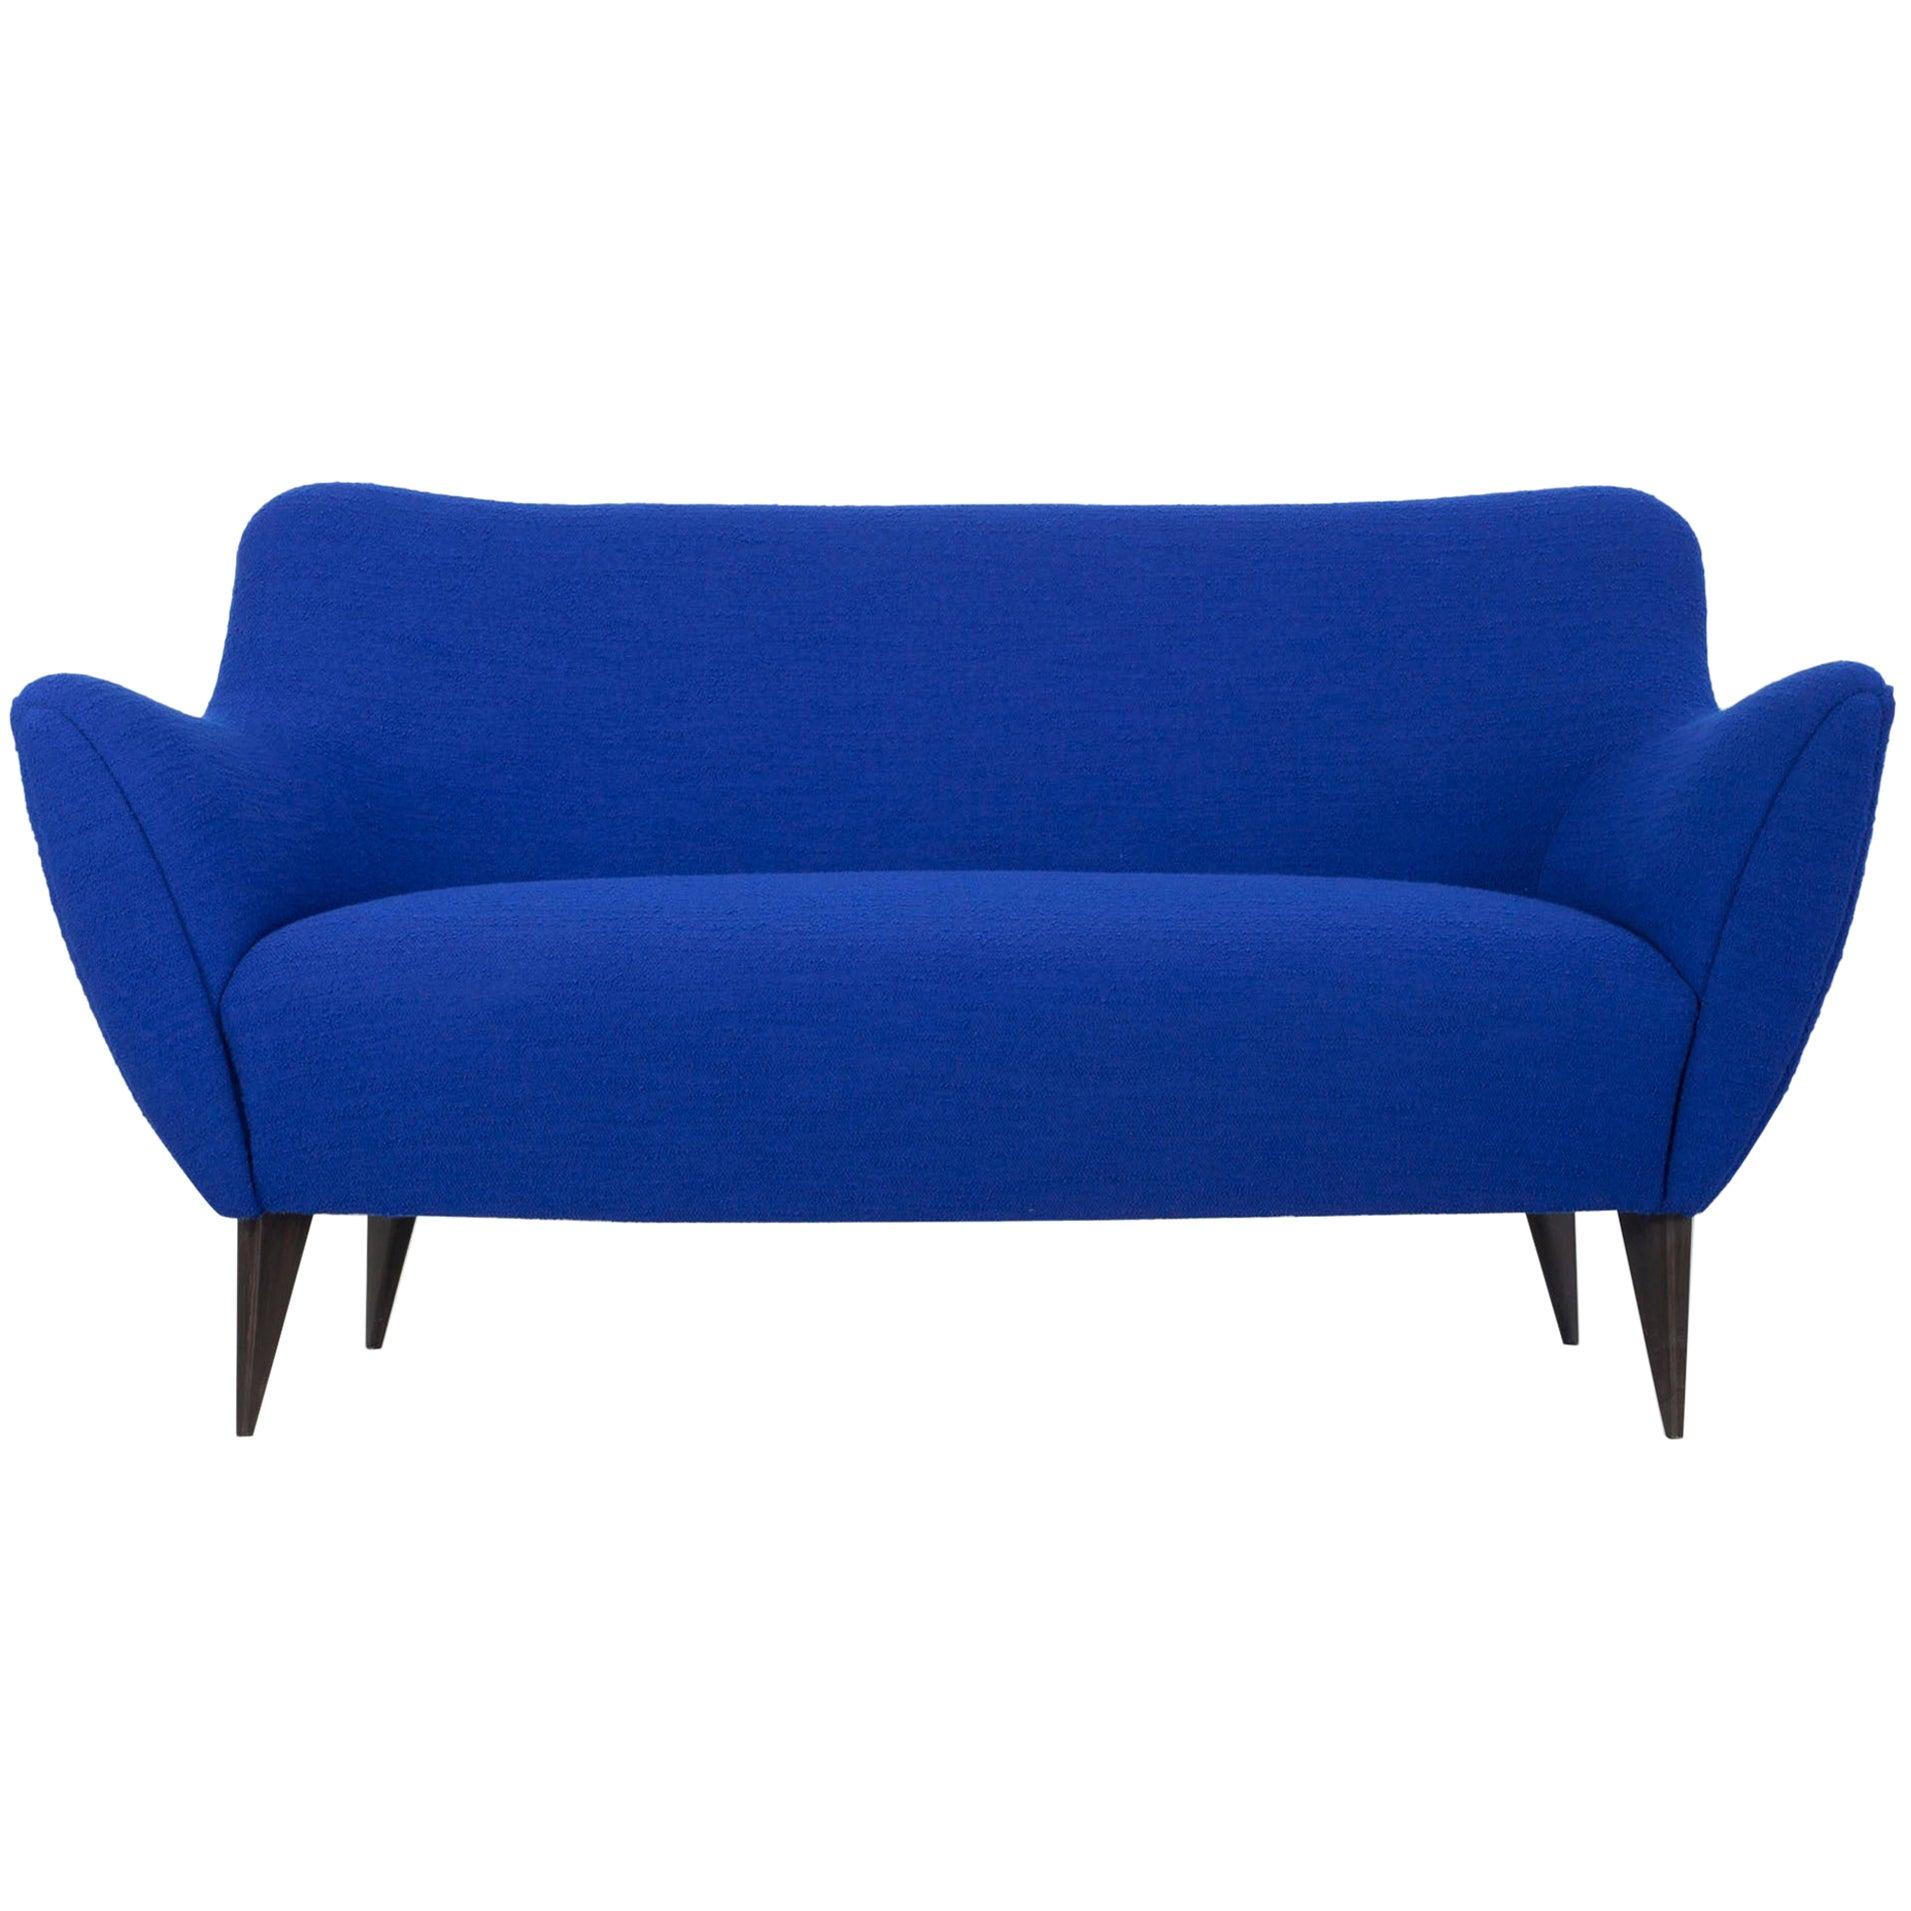 Blue Two-Seat Sofa, Design by Giulia Veronesi, ISA Bergamo, Italy, 1950s